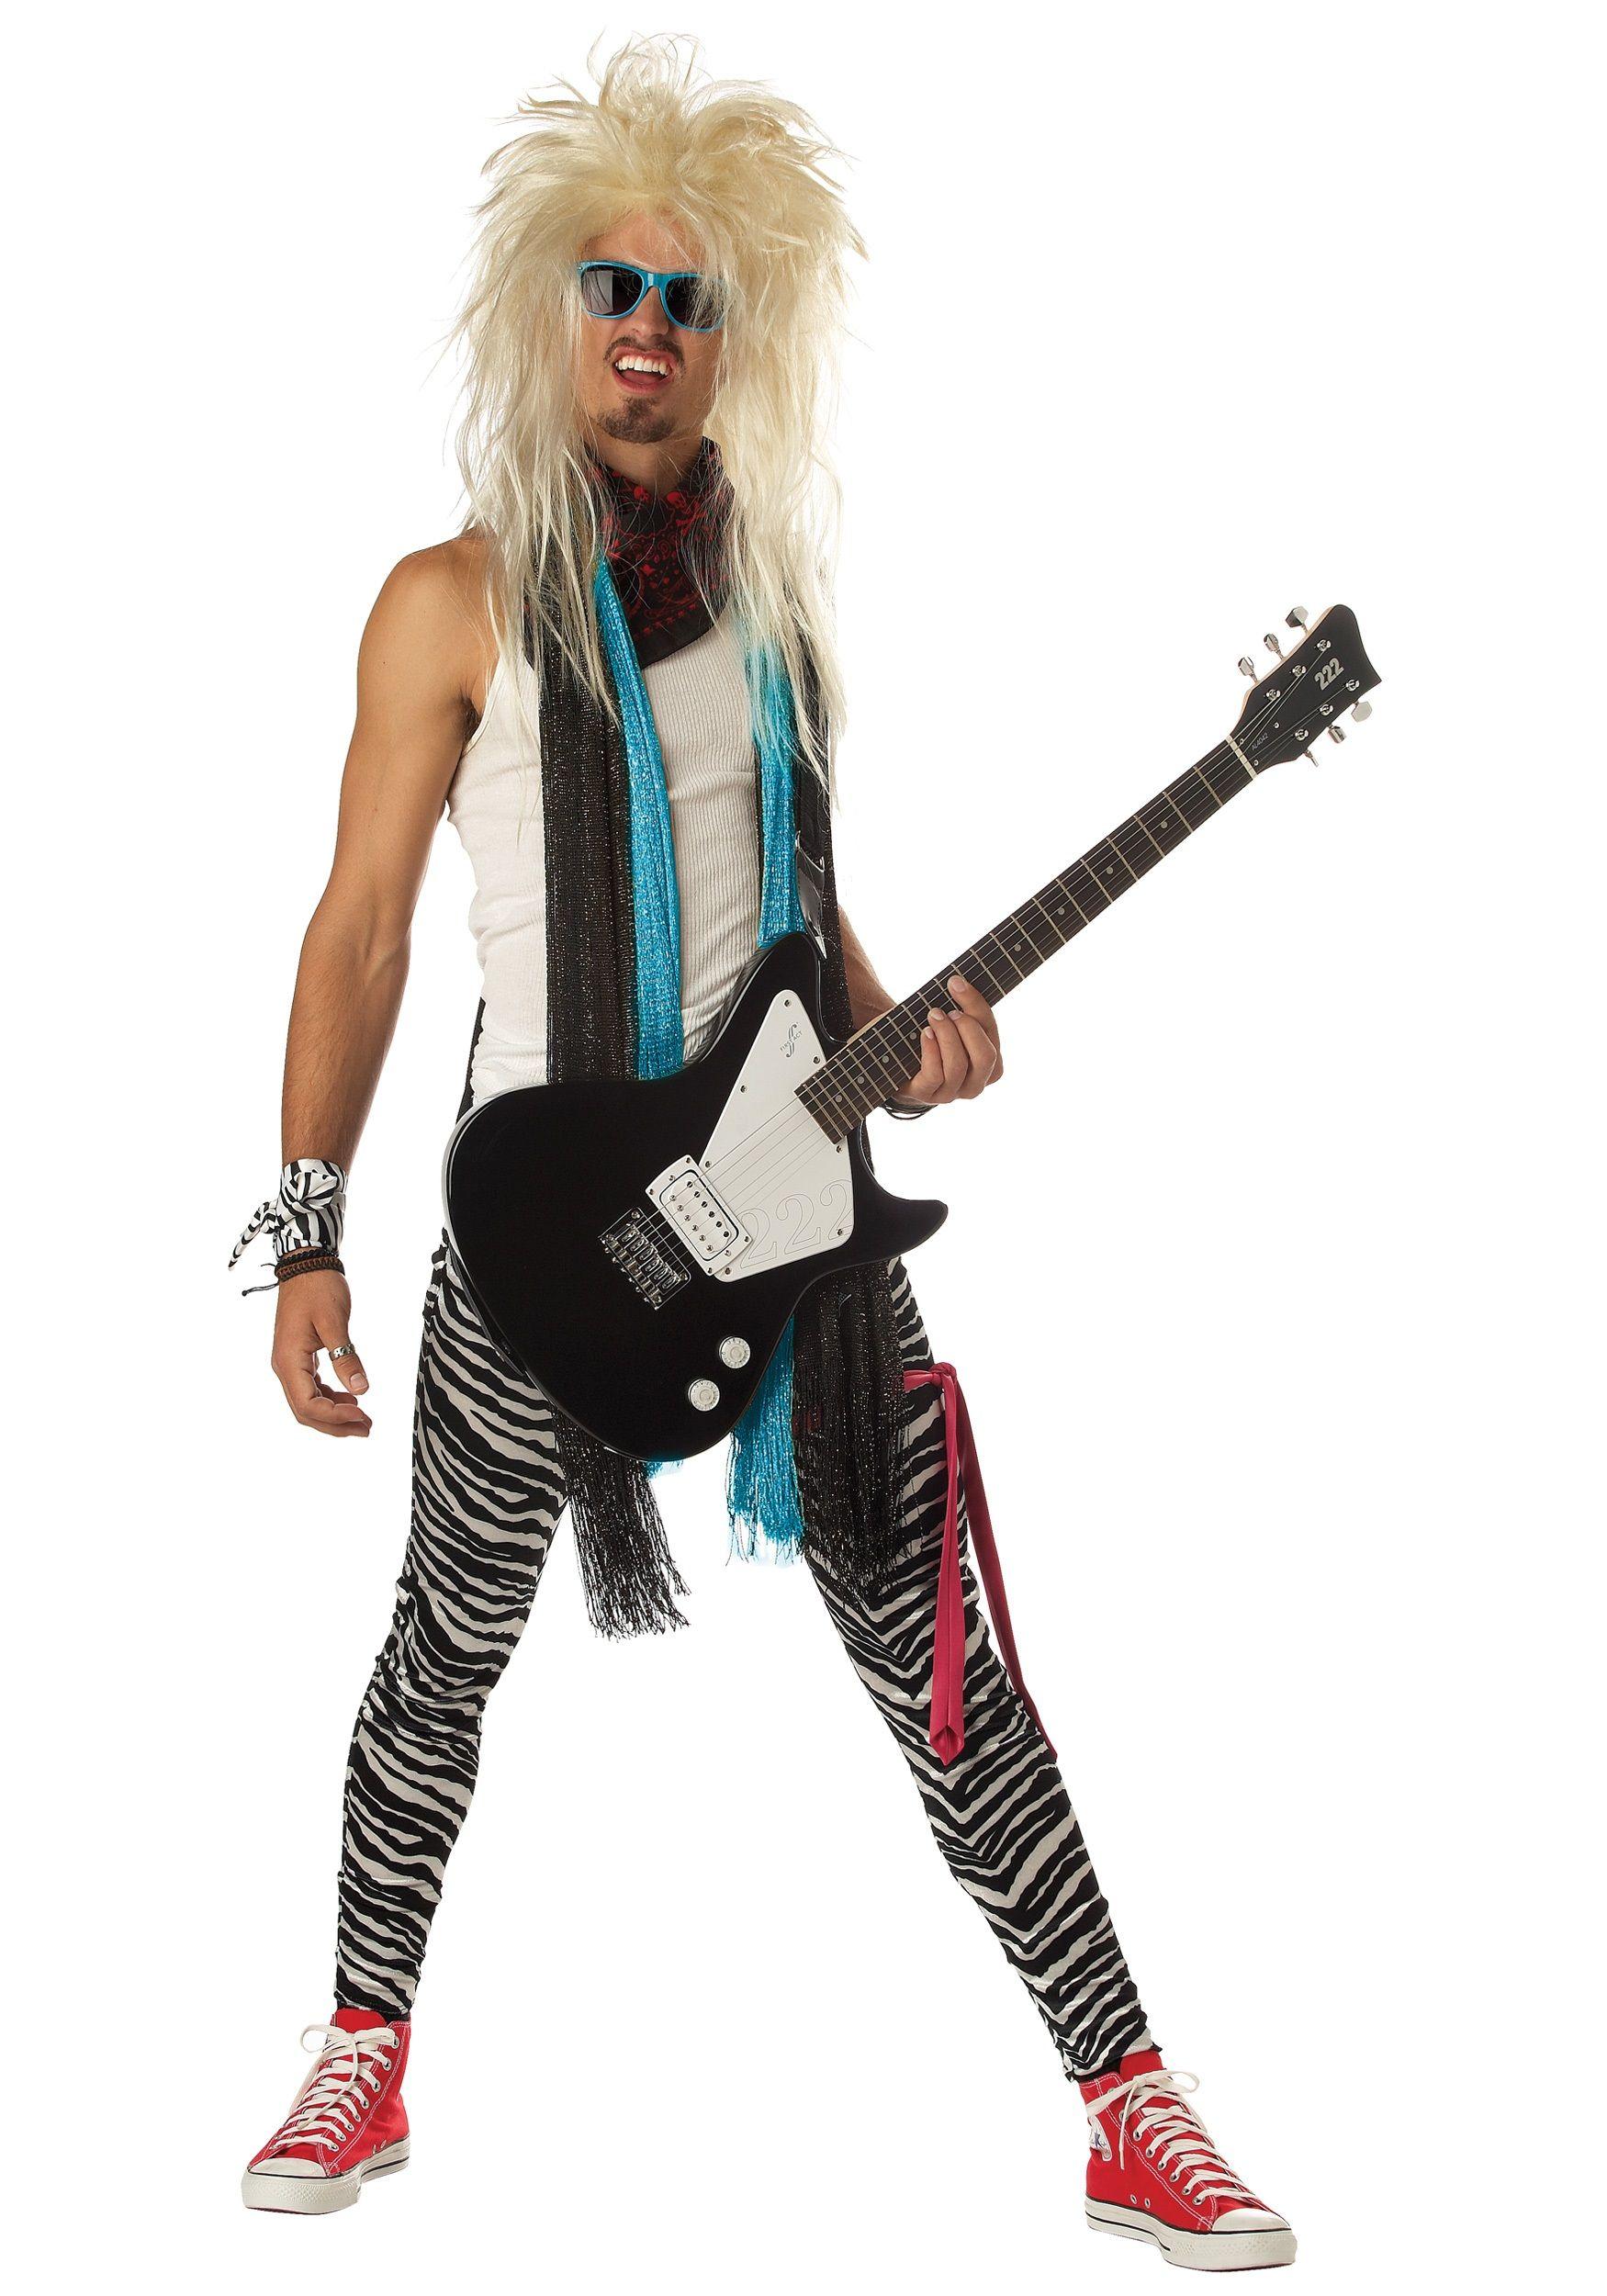 rock star | All hail The Year of The Rockstar. | Rock star ...